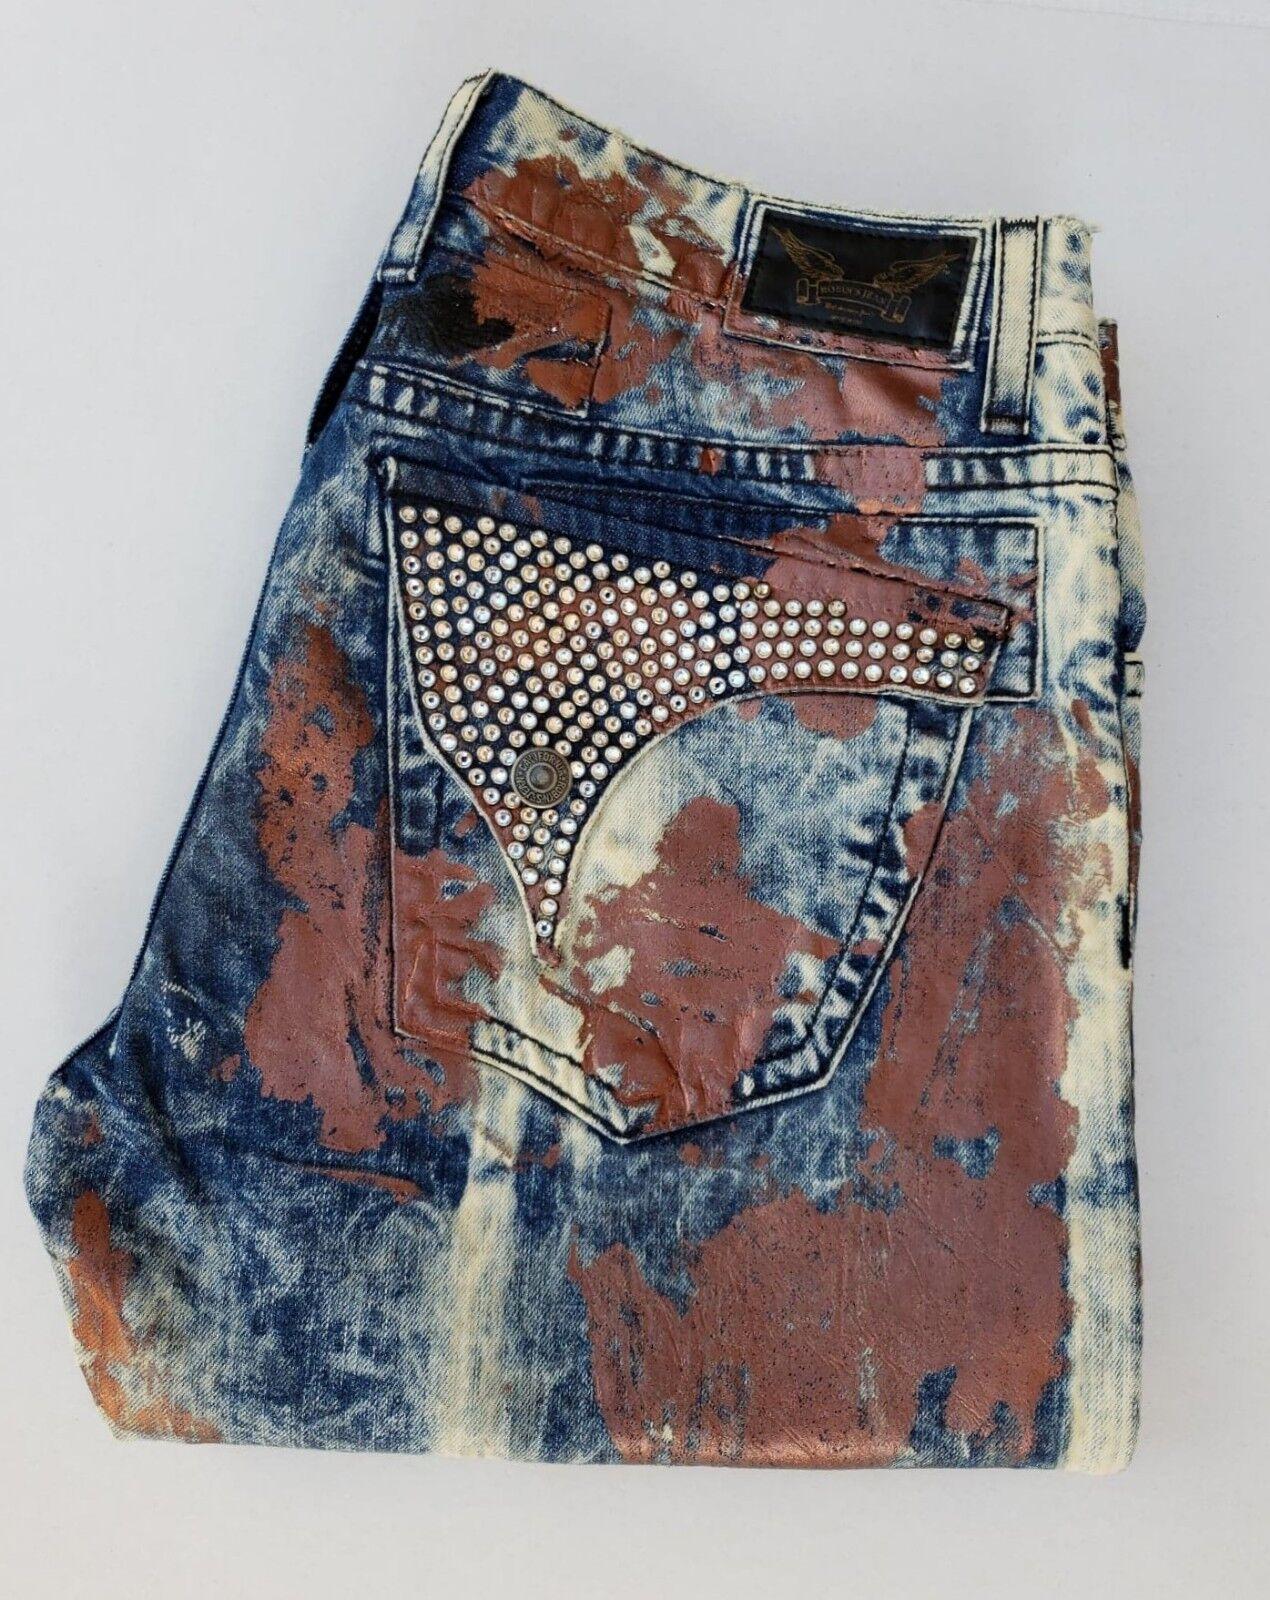 Nuevo Para hombres Robin's Jean Talla 40 Jeans Rectos Rectos Rectos Con Tachas revestido-lavado de Cooper 1775e3